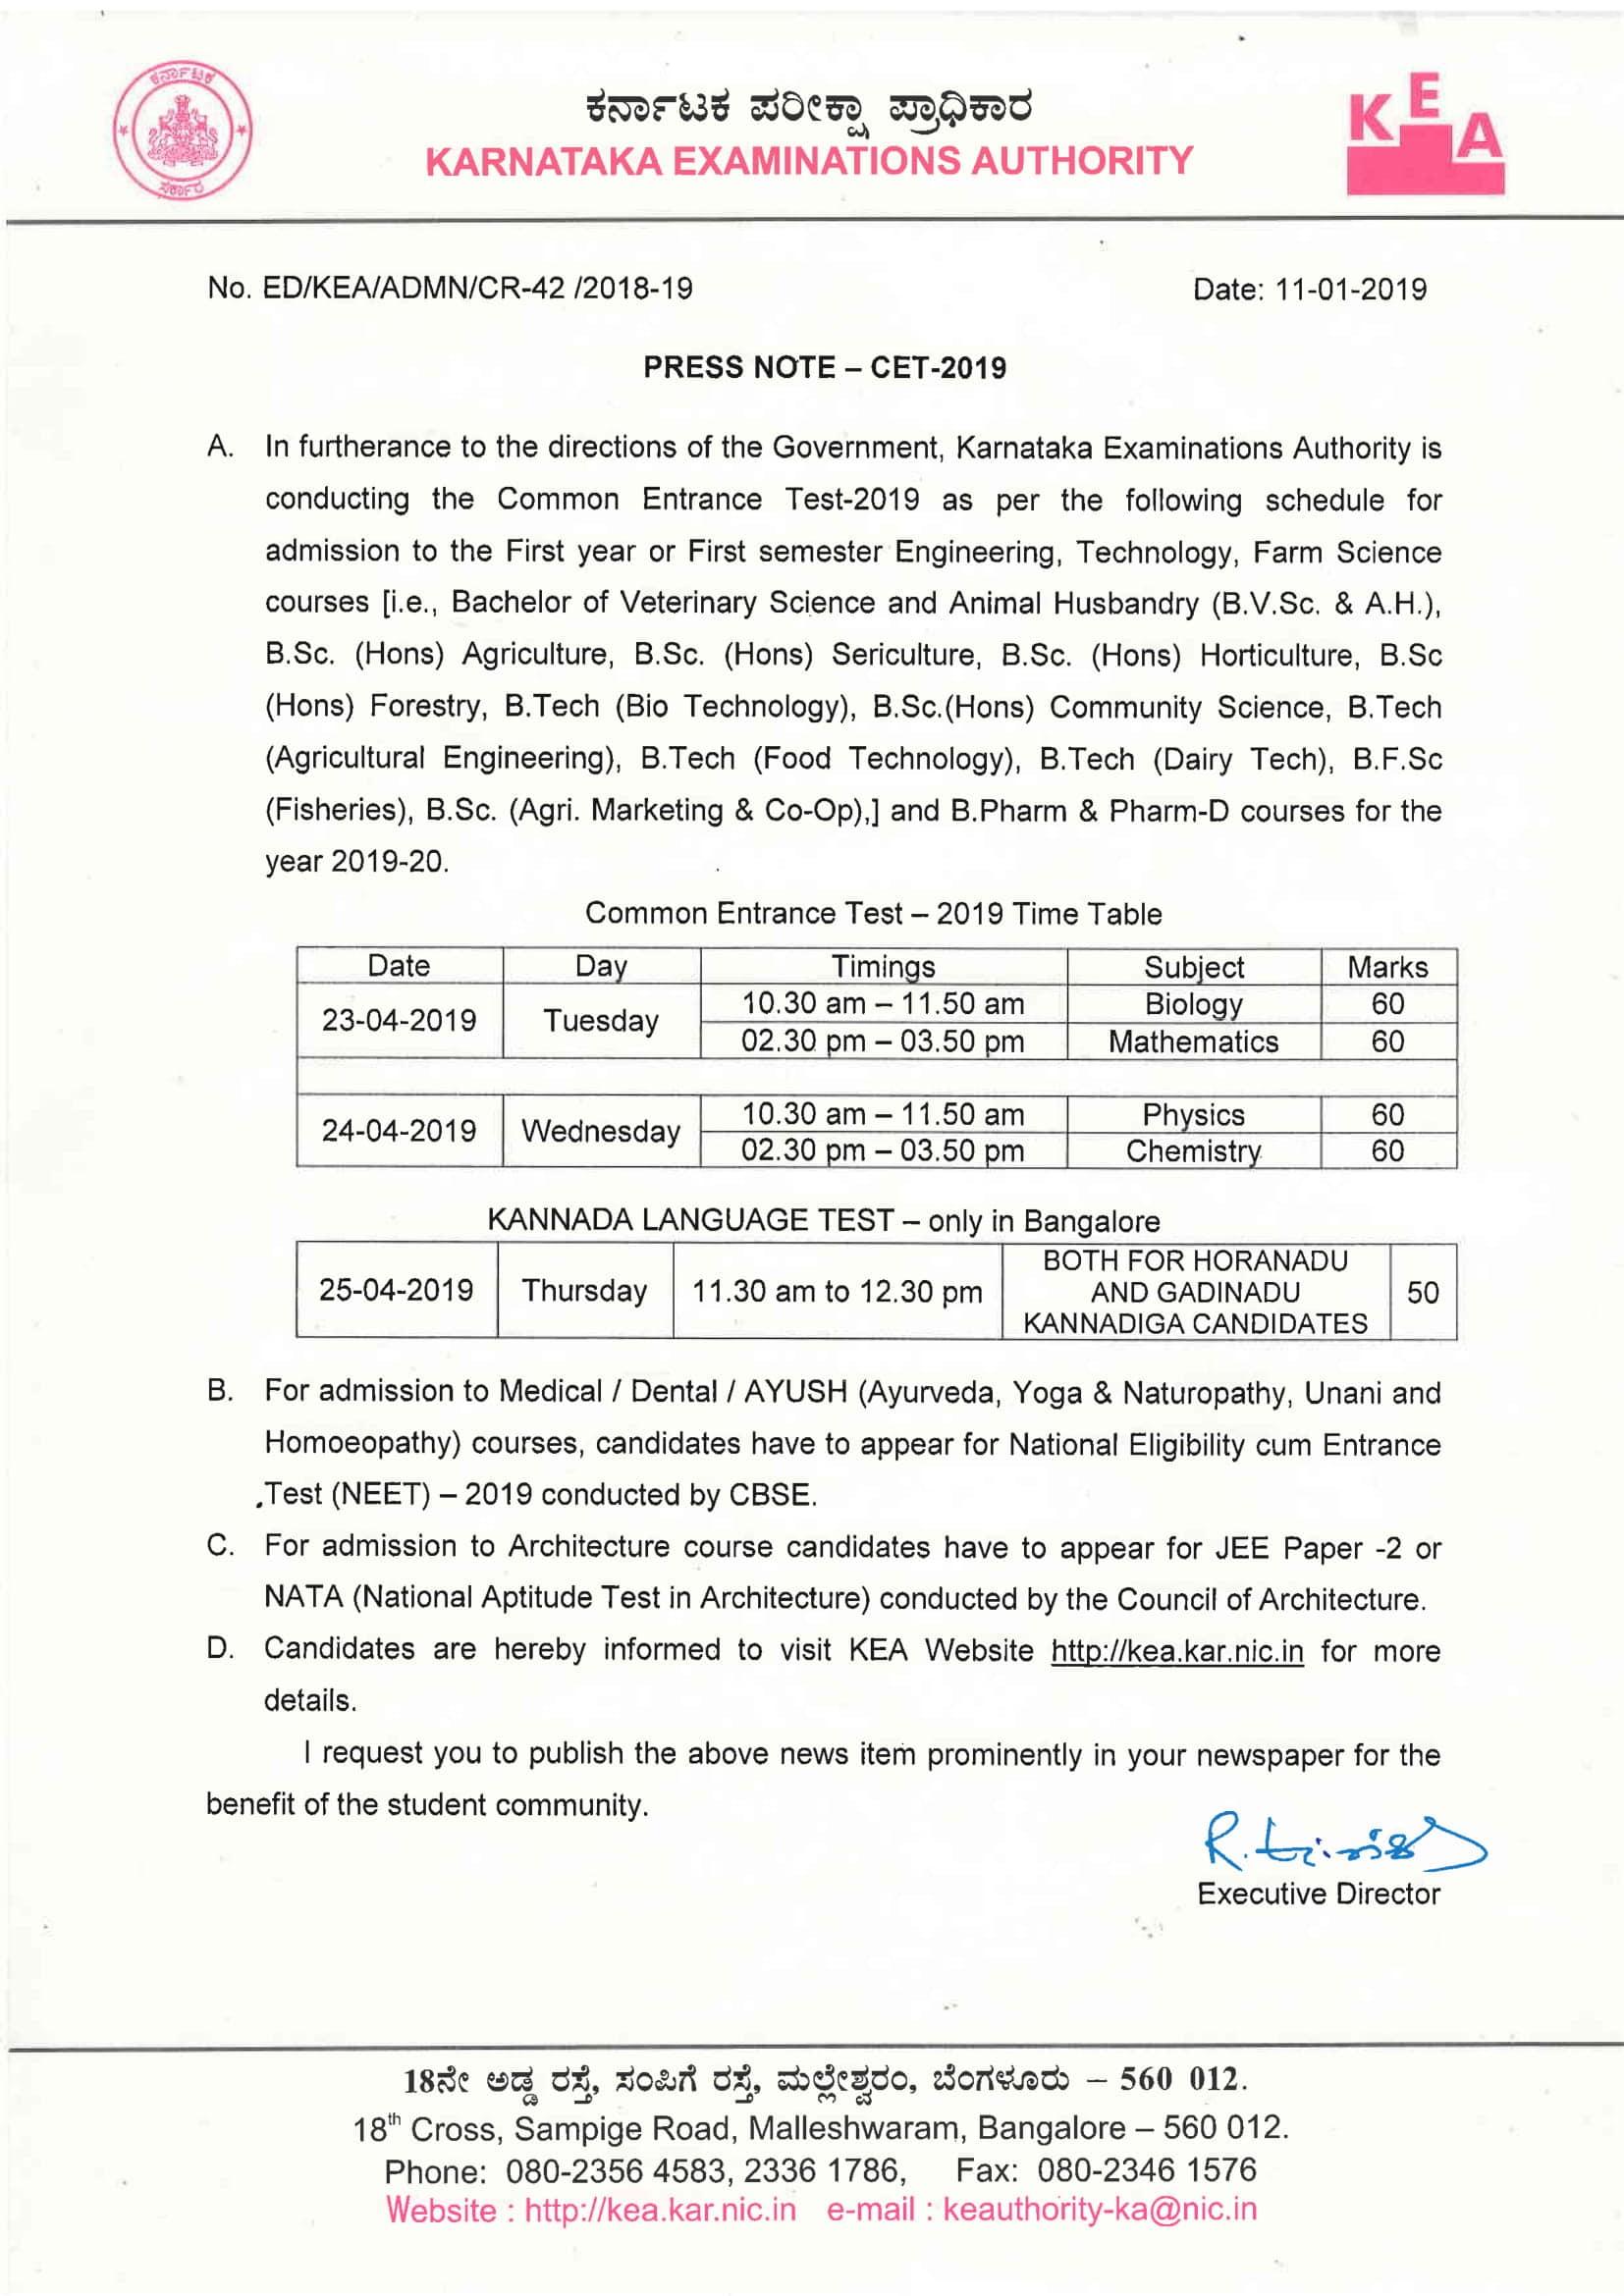 KCET Exam Dates 2019